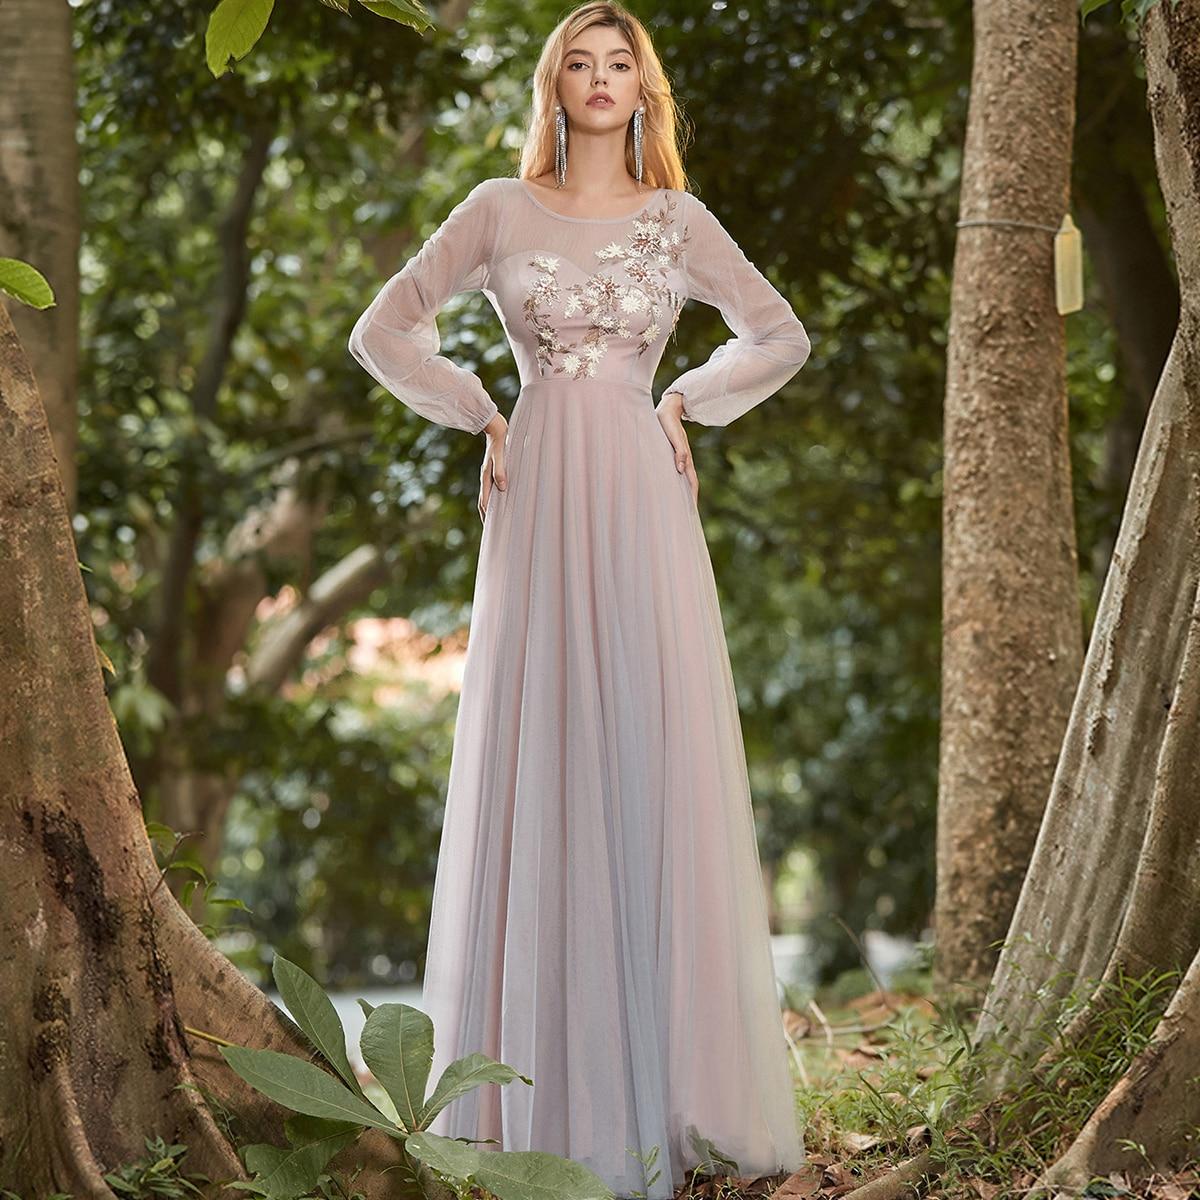 Applique Mesh Prom Dress